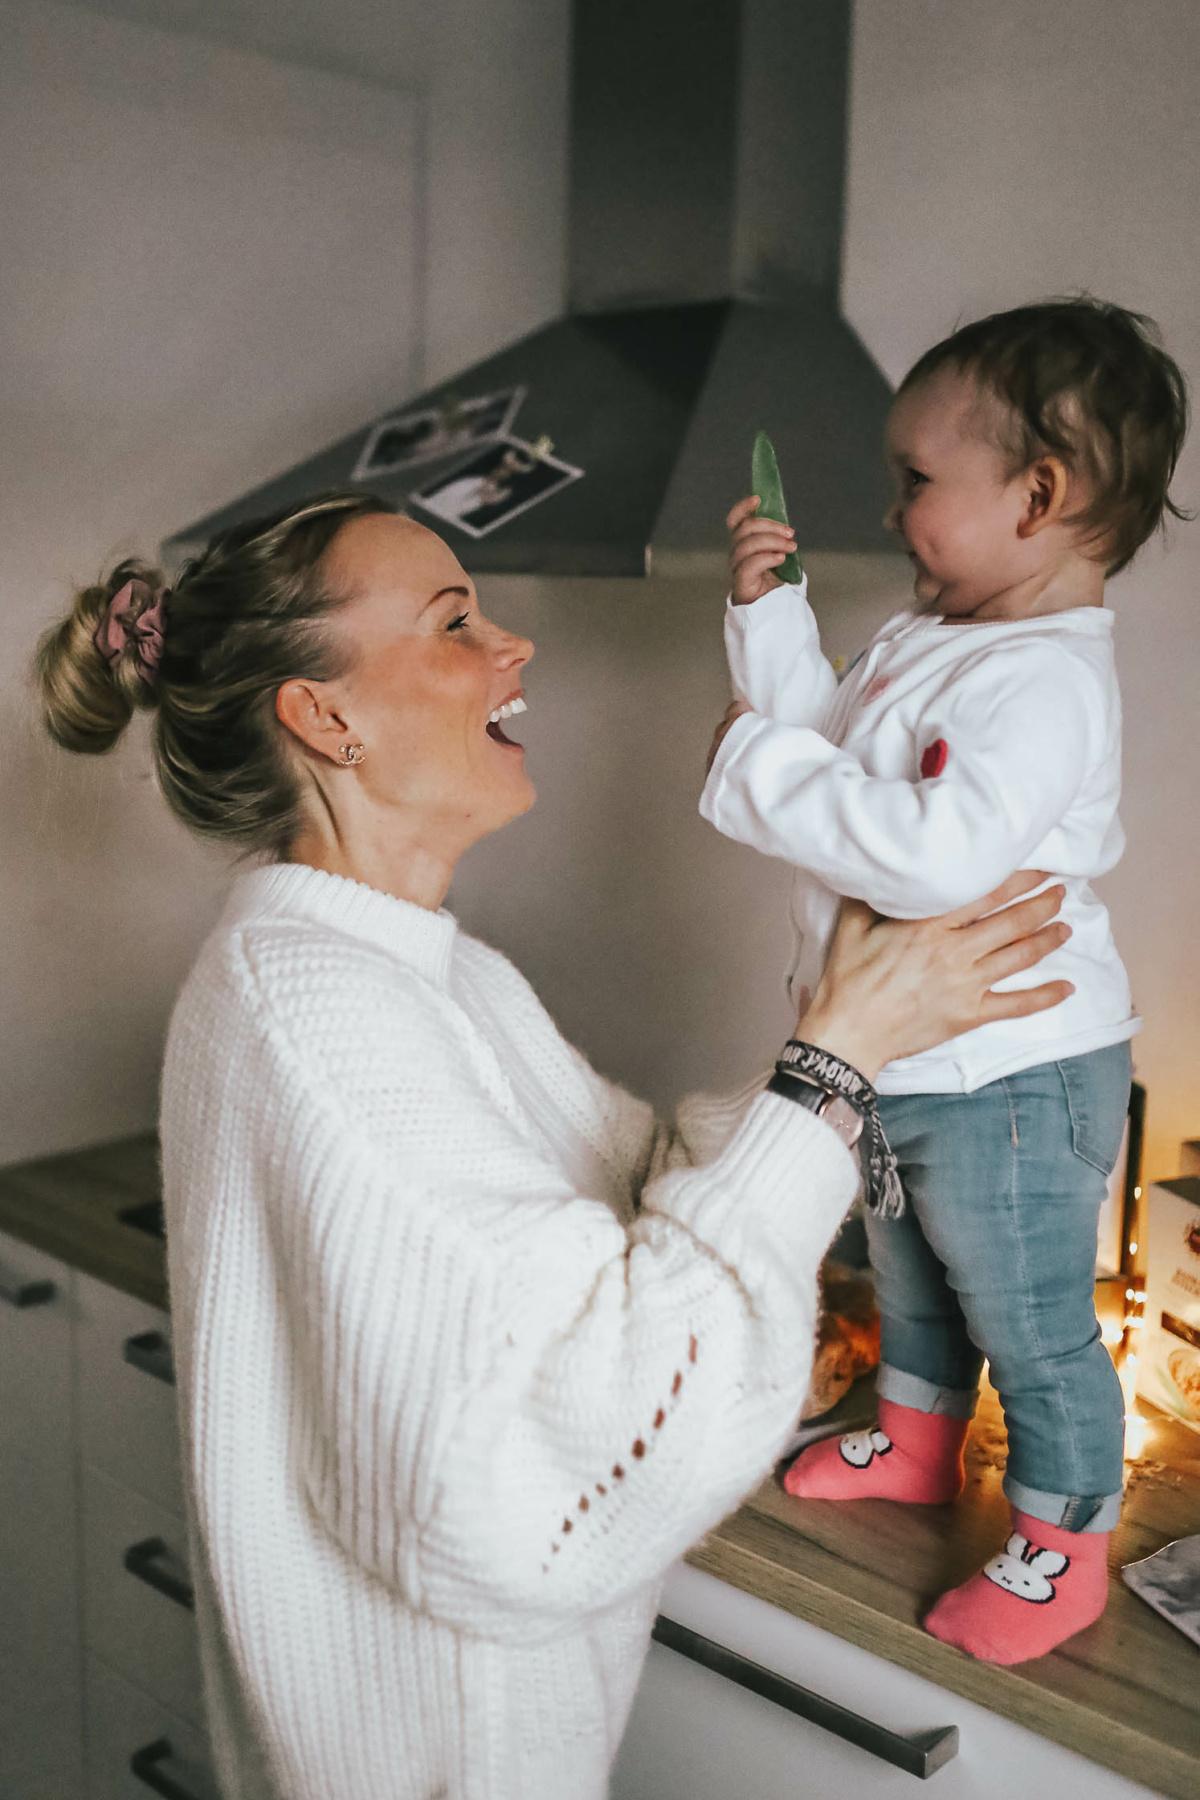 stylingliebe-lifestyleblog-mamablog-fashionblog-muenchen-familienblog-blogger-deutschland-lifestyleblog-familienblogger-lifestyleblogger-mein-genussritual-mit-veganem-rezept-5